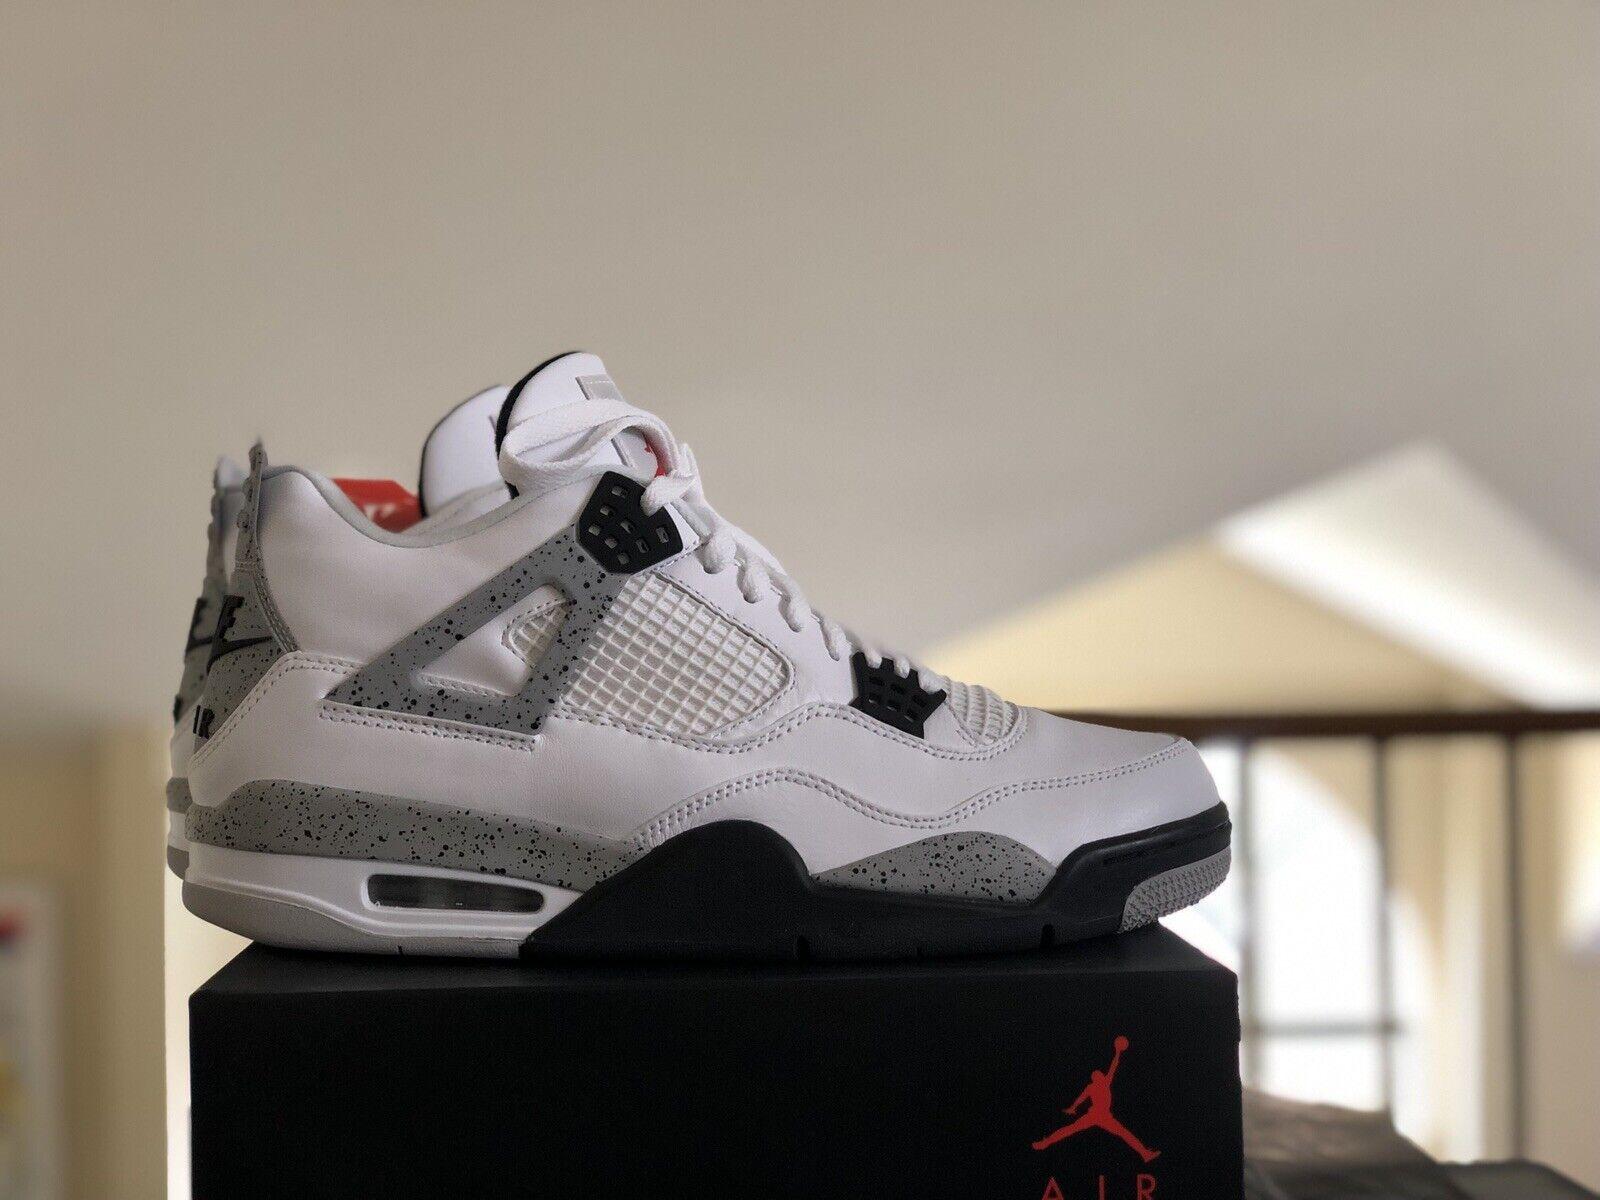 2016 Nike Air Jordan Retro 4 IV OG 840606 192 Size 11 Cement White Grey NEW NDS